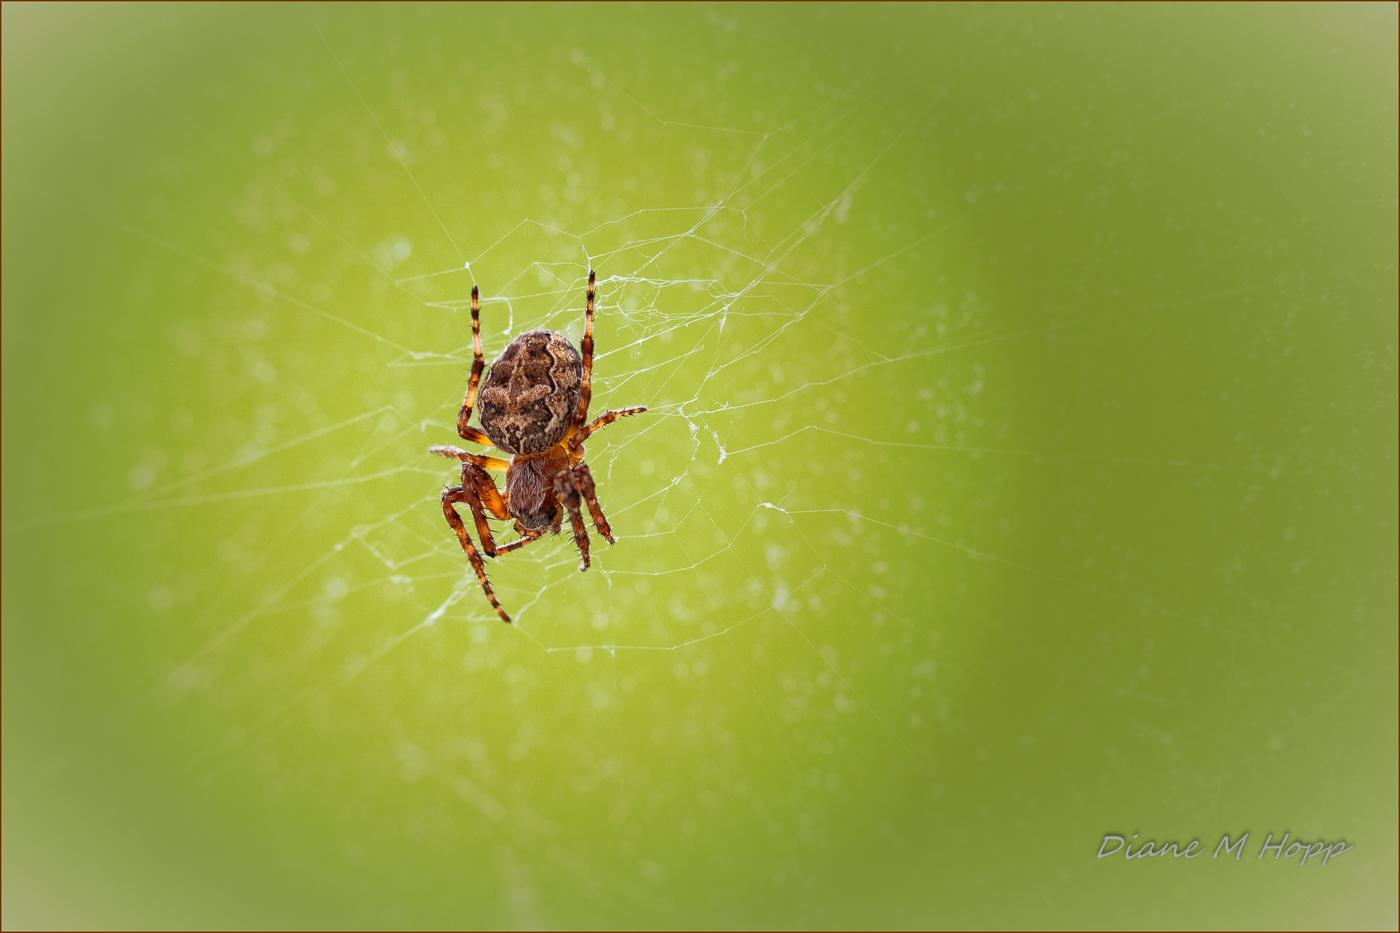 Spider on Glass - DMHopp